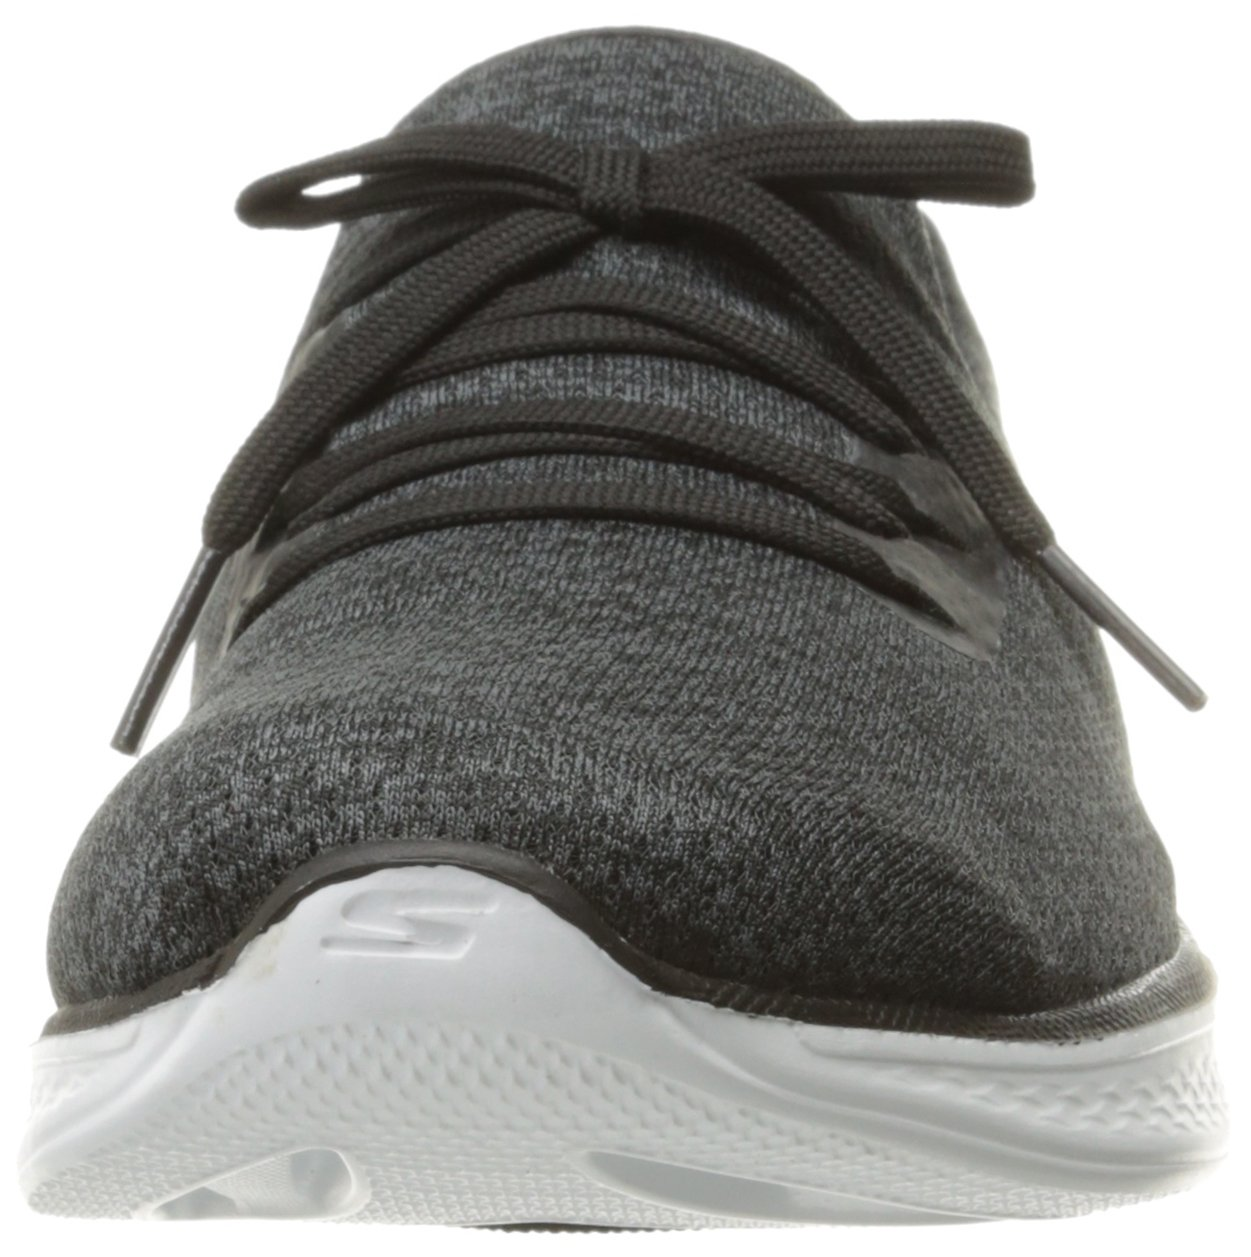 Skechers Performance Women's Go Walk 4 A.D.C. All Day Comfort Walking Shoe B01J2O01CQ 8 B(M) US Black/White